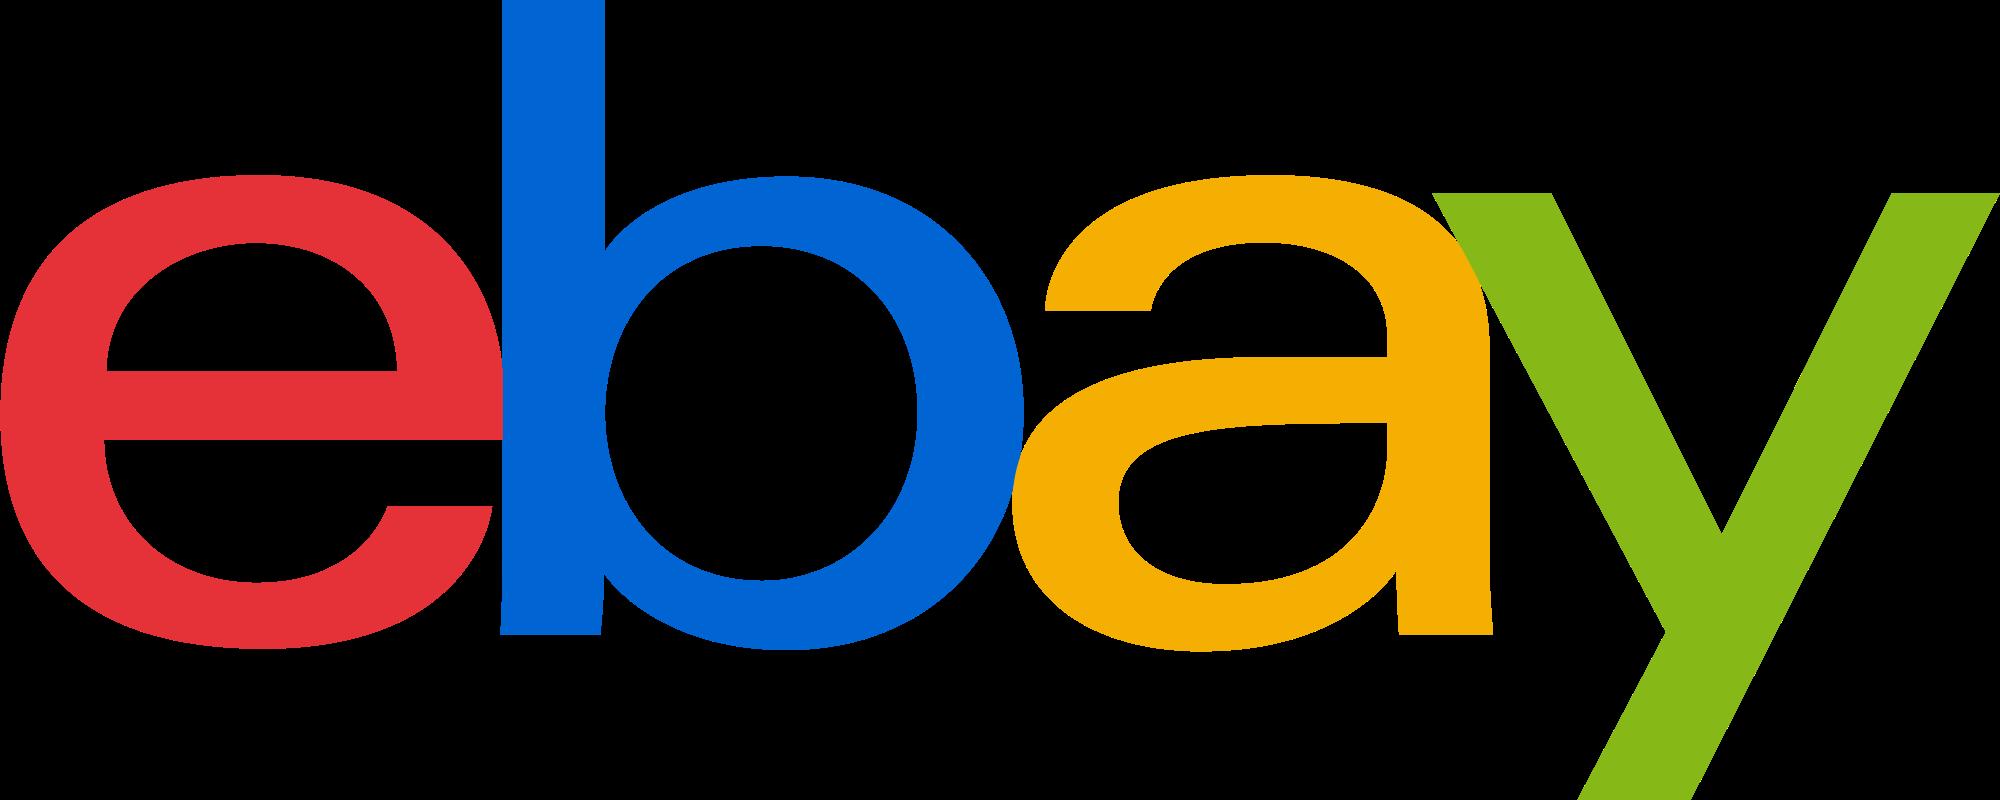 Ebay contact